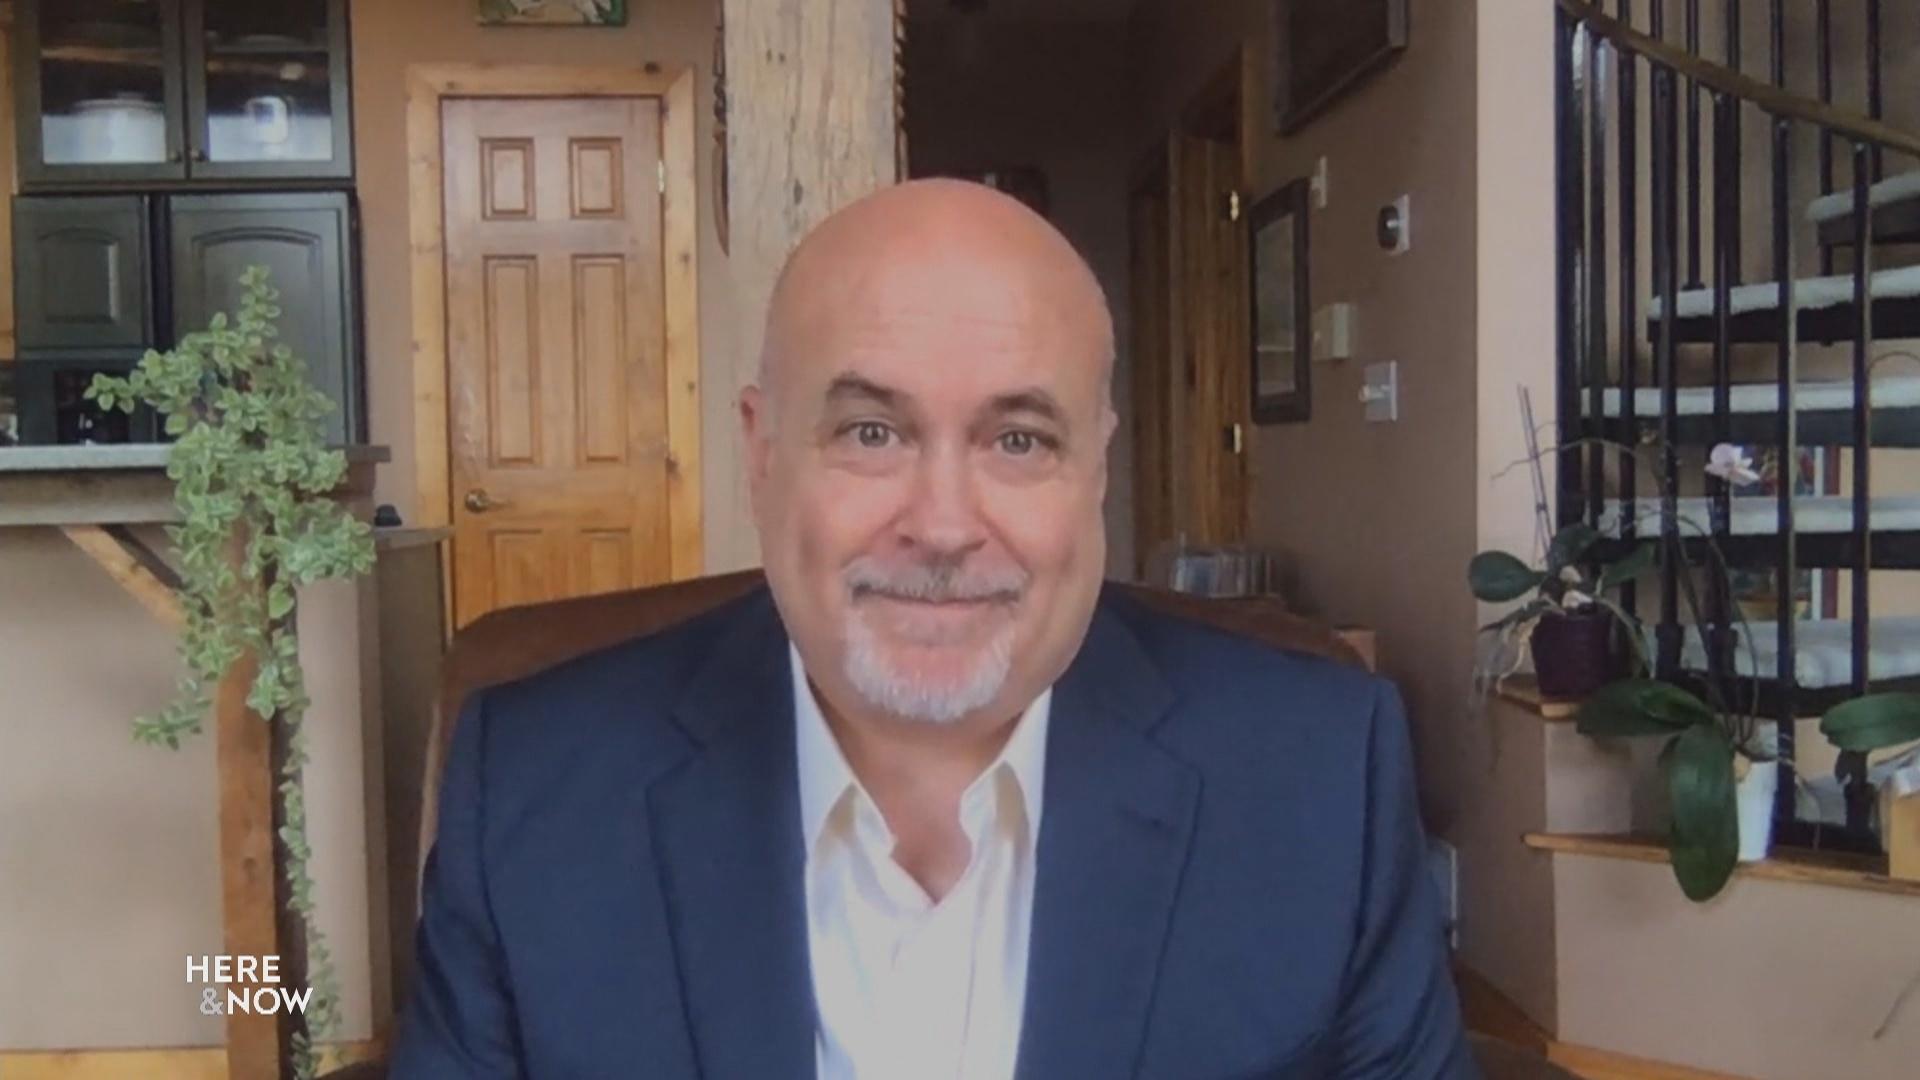 U.S. Rep. Mark Pocan (D) on Next Coronavirus Relief Bill